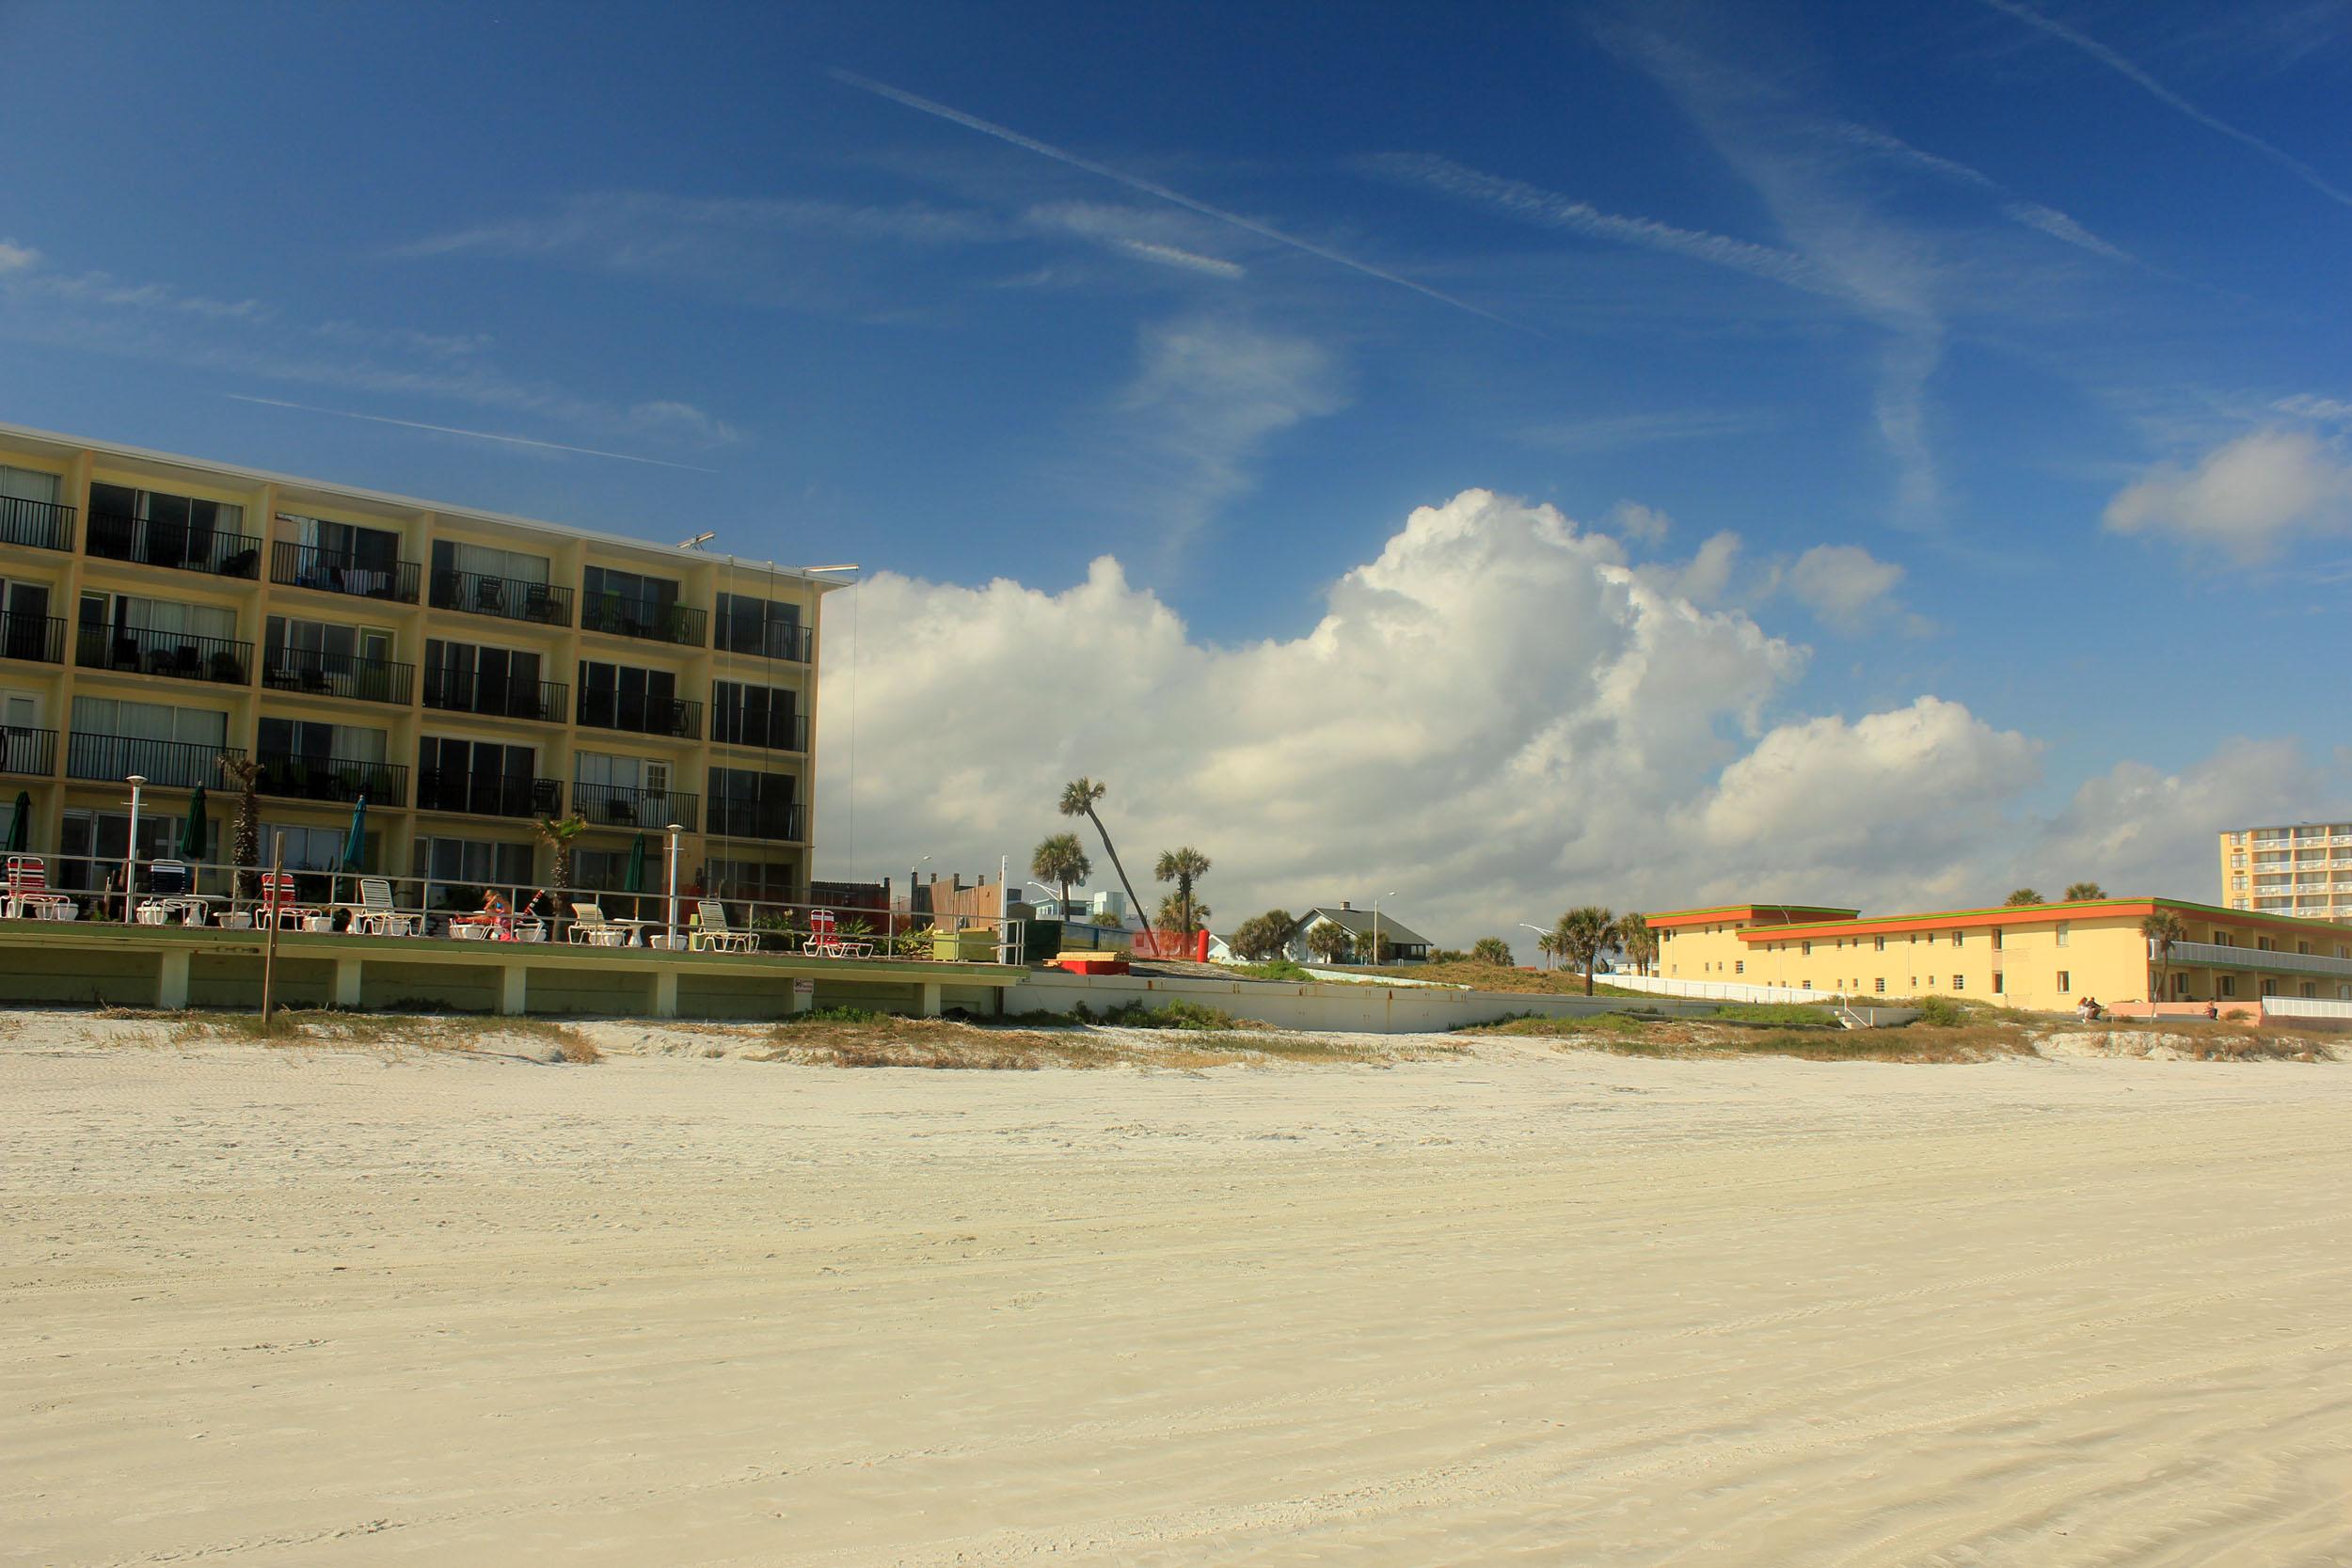 Daytona Beach Commercial Rental Property